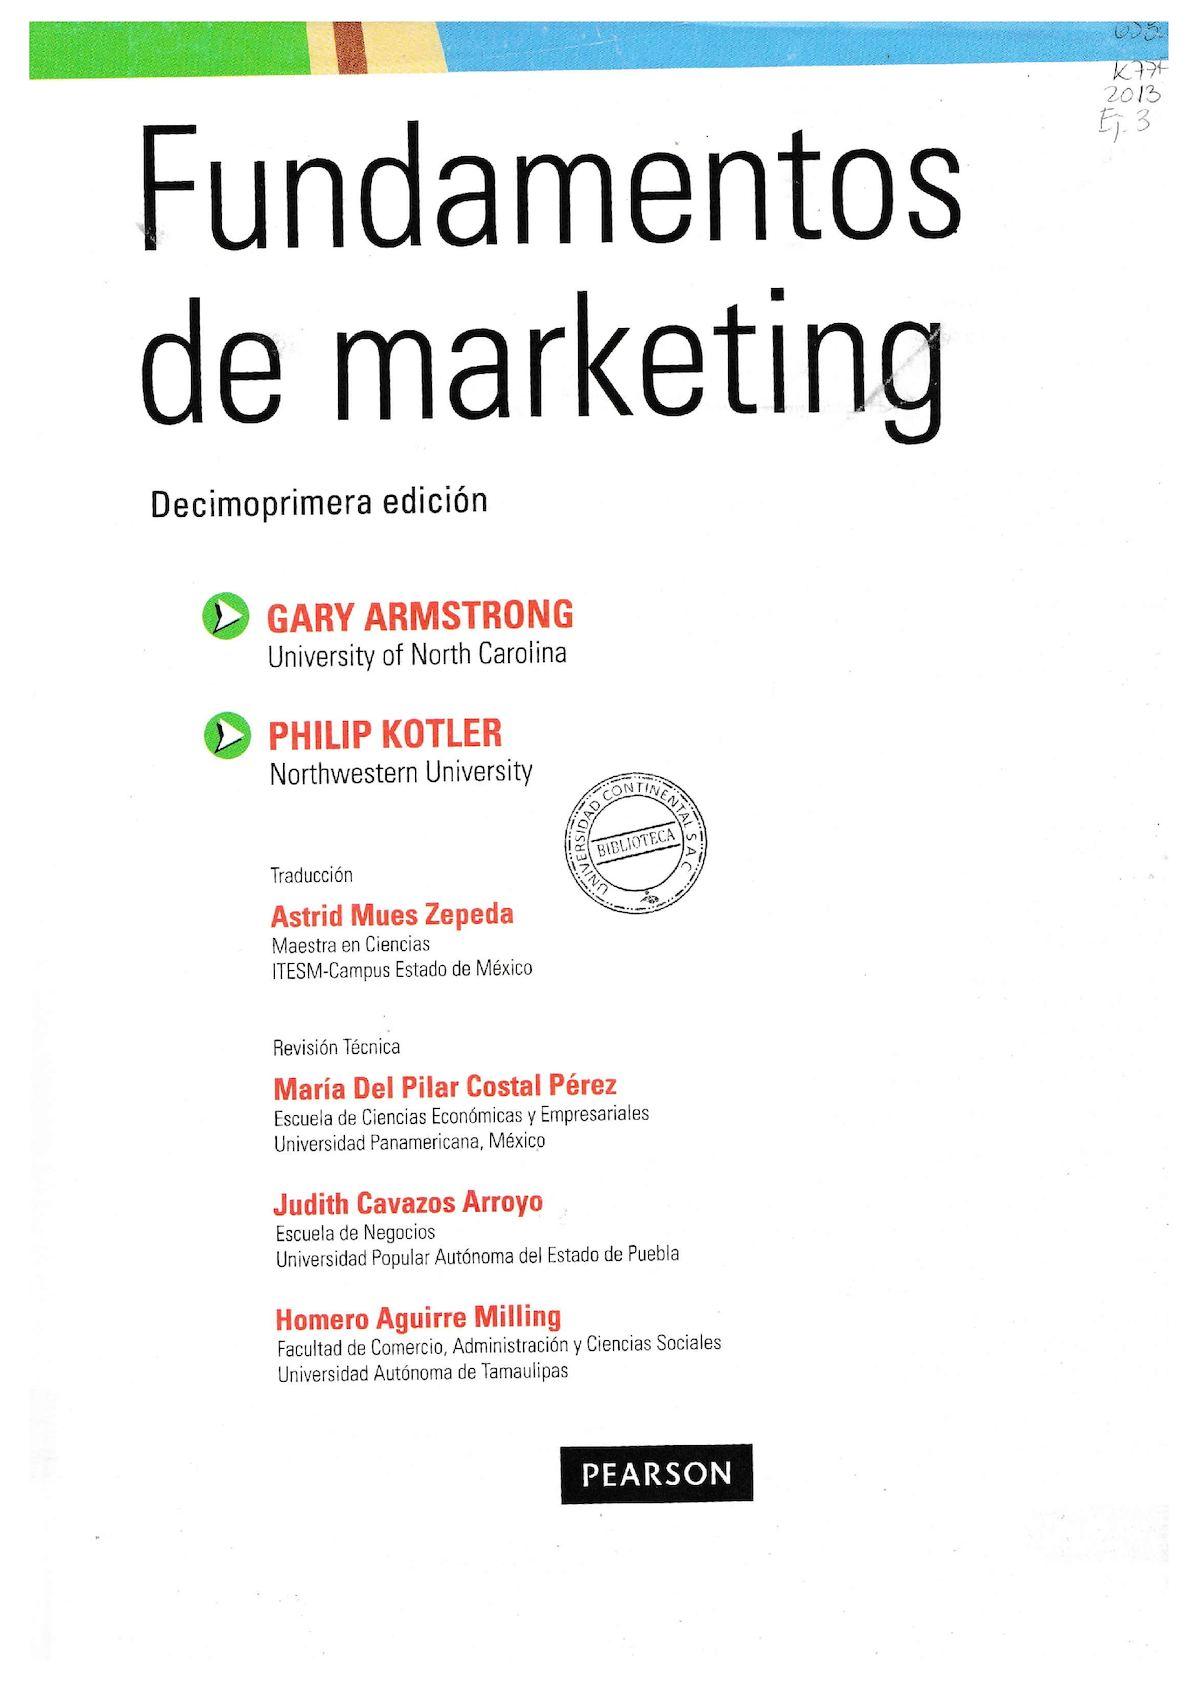 Calaméo - MATERIAL DE FUNDAMENTOS DE MARKETING - COMPLETO